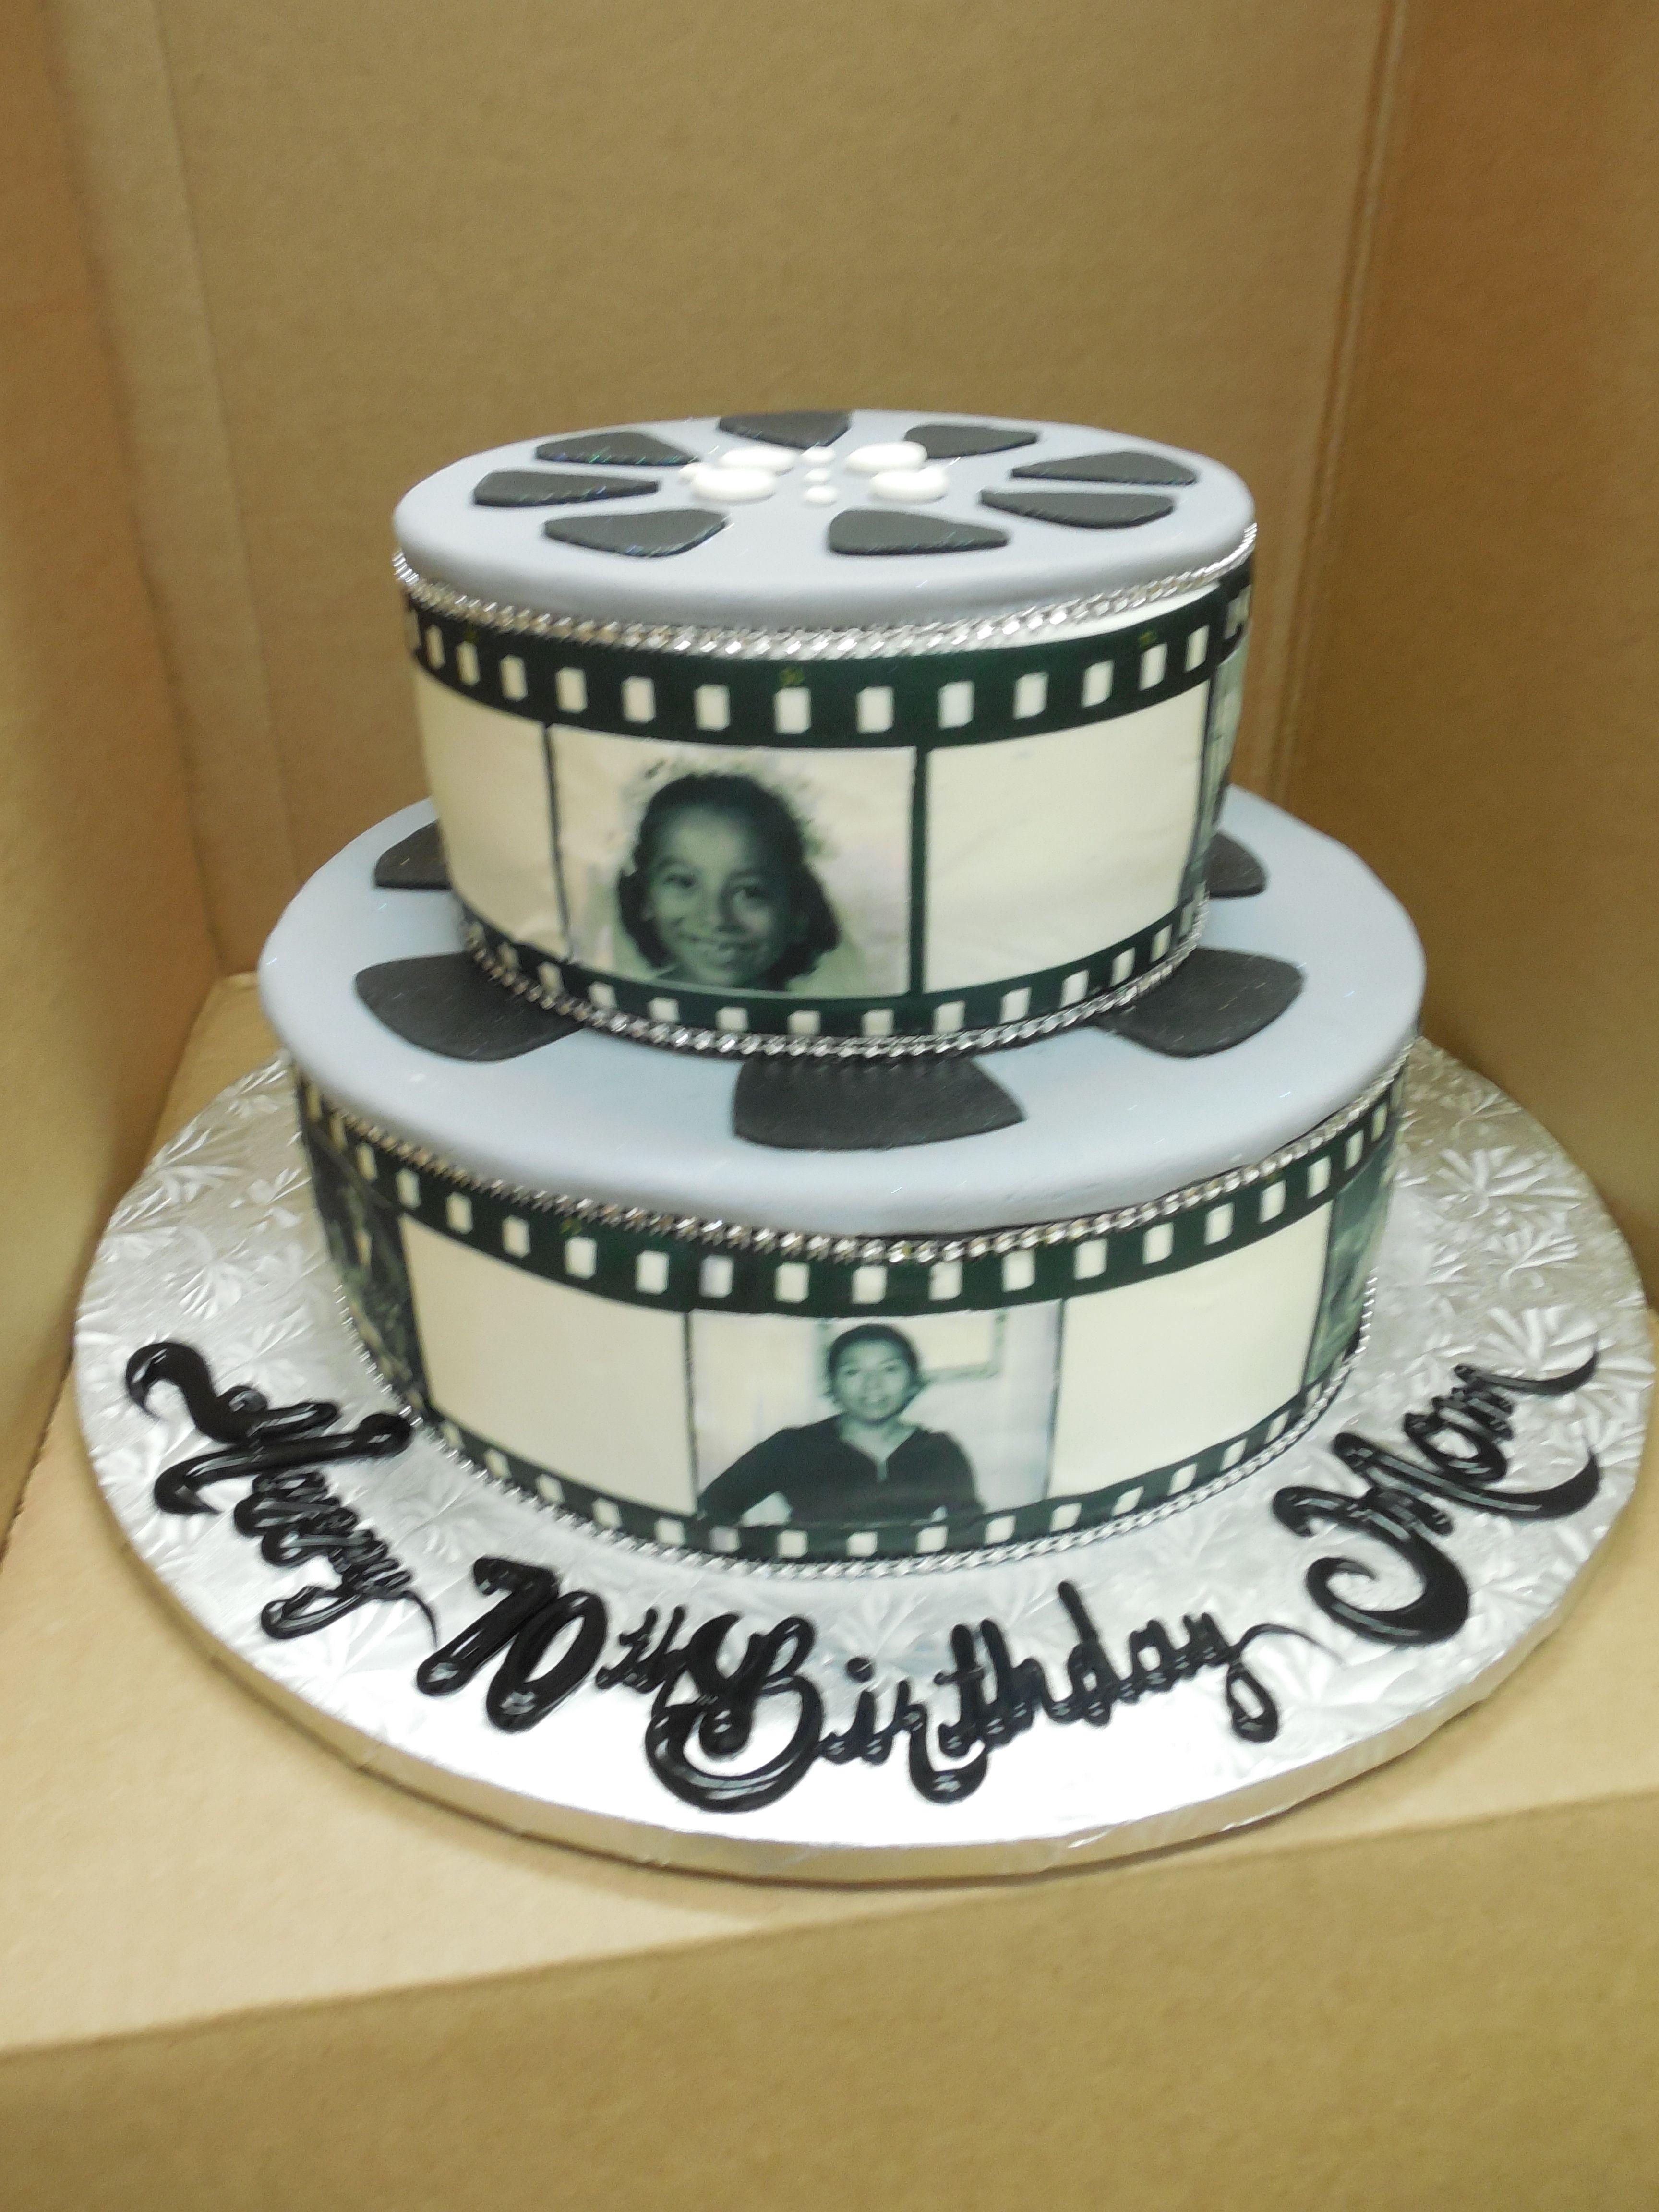 Remarkable Calumet Bakery Movie Reel Birthday Cake With Images Photo Cake Personalised Birthday Cards Epsylily Jamesorg